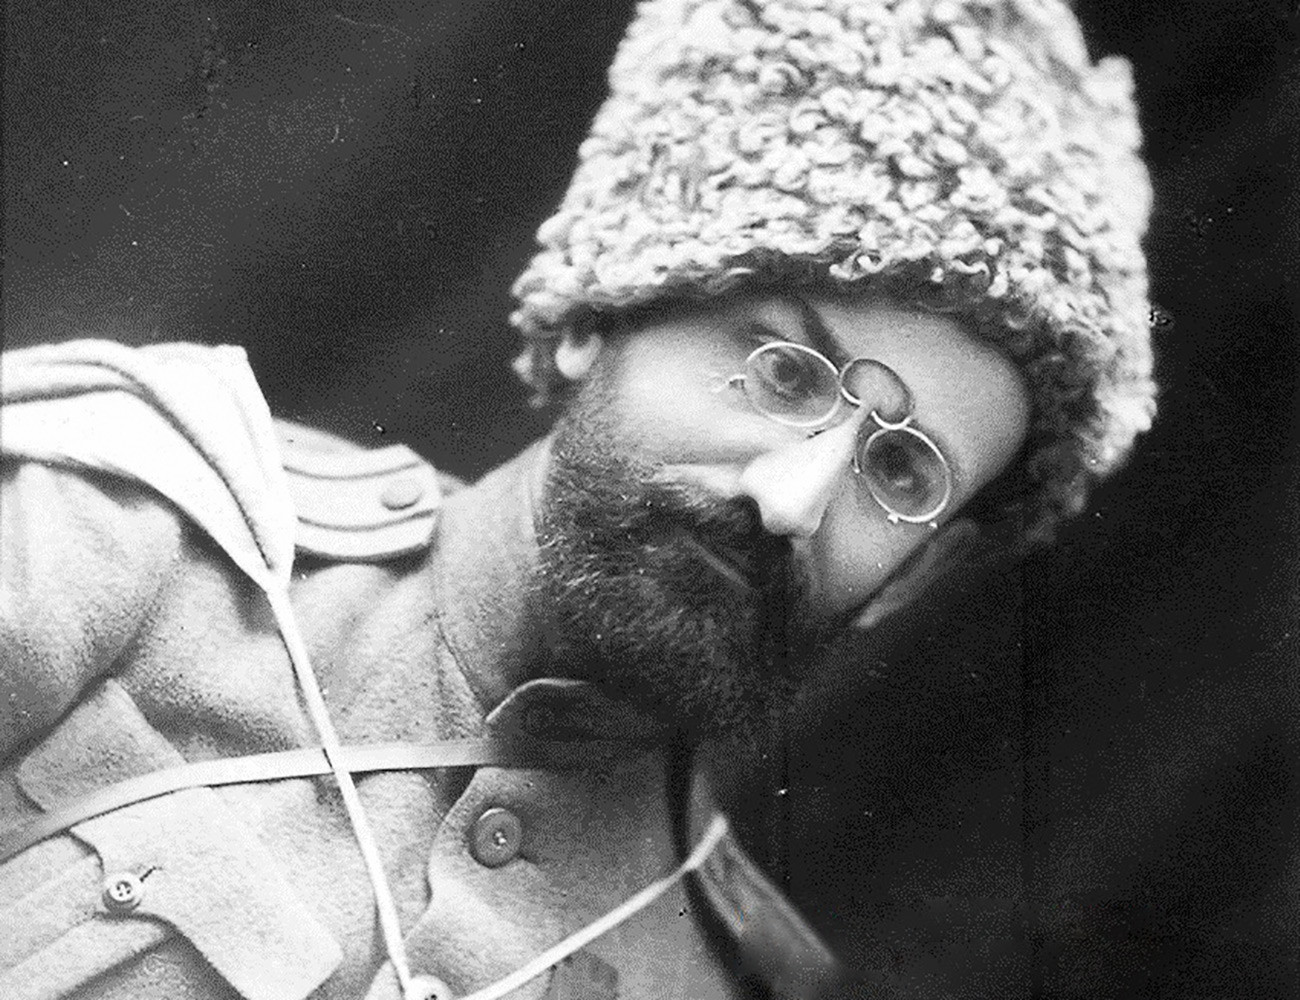 Ivan Timofeevich Belyaev